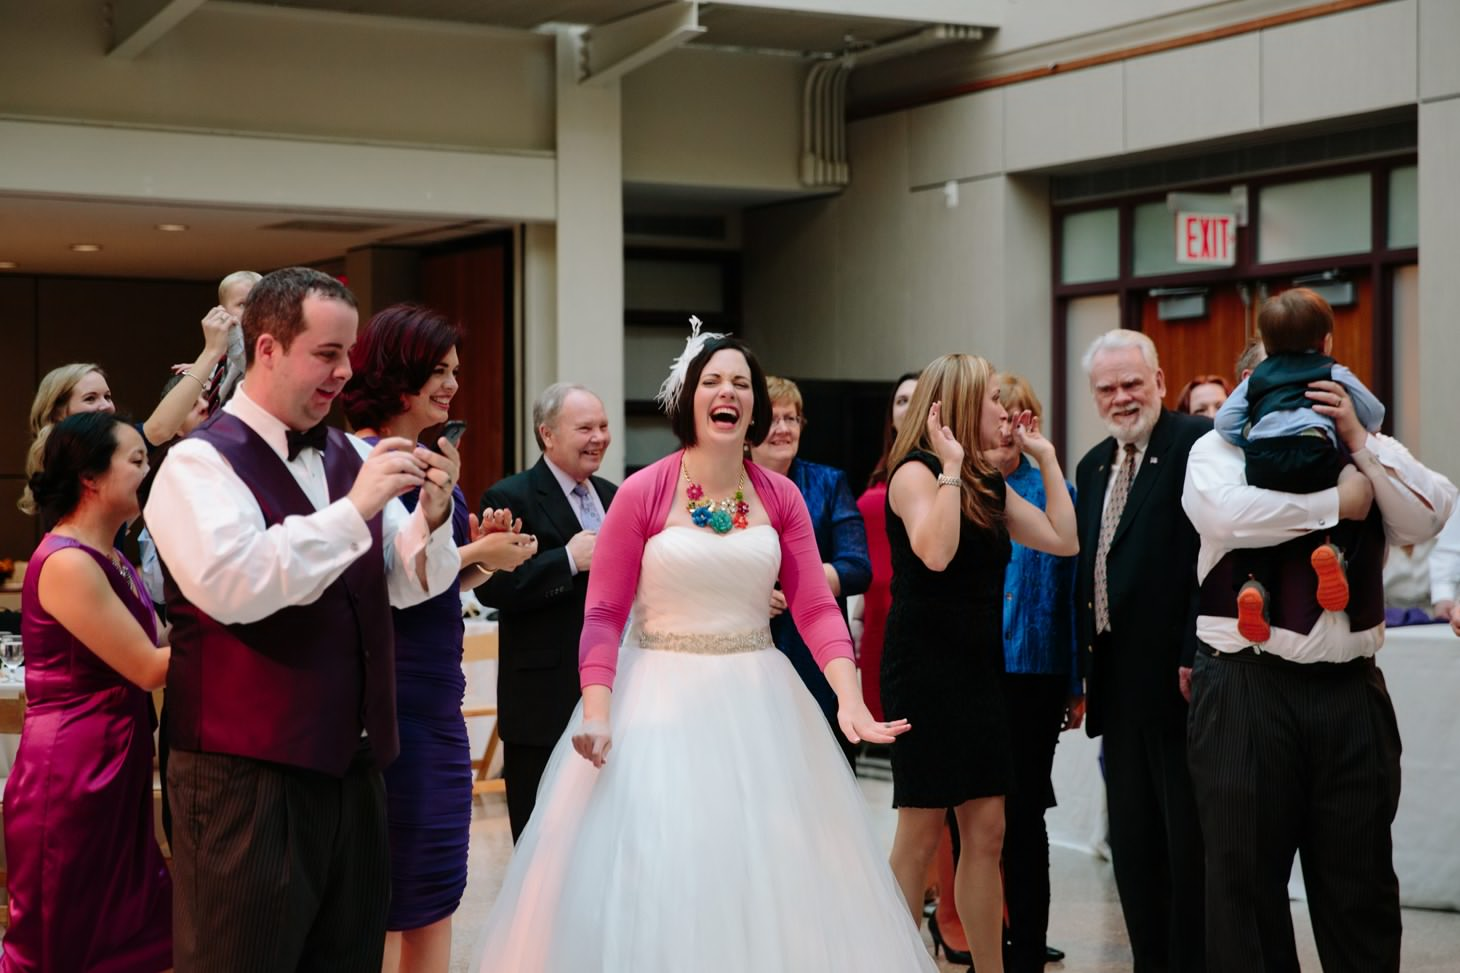 066-nyc-wedding-photographer-smitten-chickens-nj-montclair-art-museum.jpg